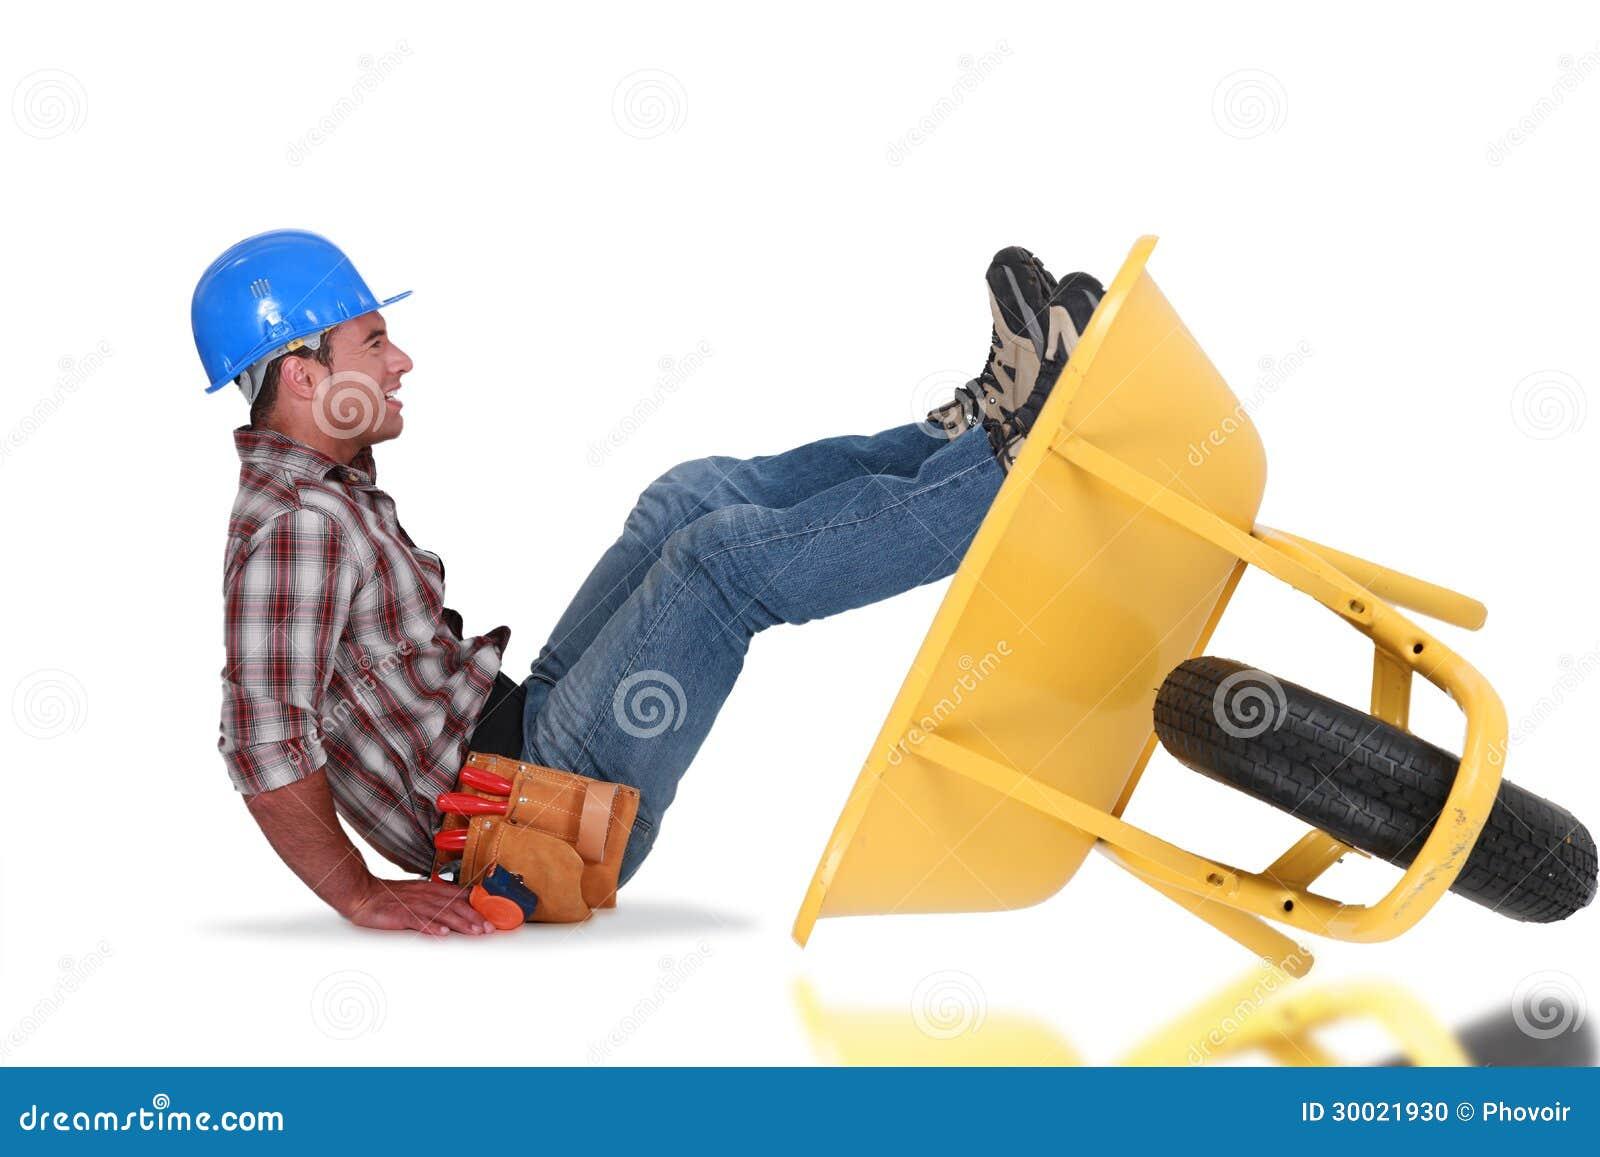 ma on avec une brouette photo stock image 30021930. Black Bedroom Furniture Sets. Home Design Ideas